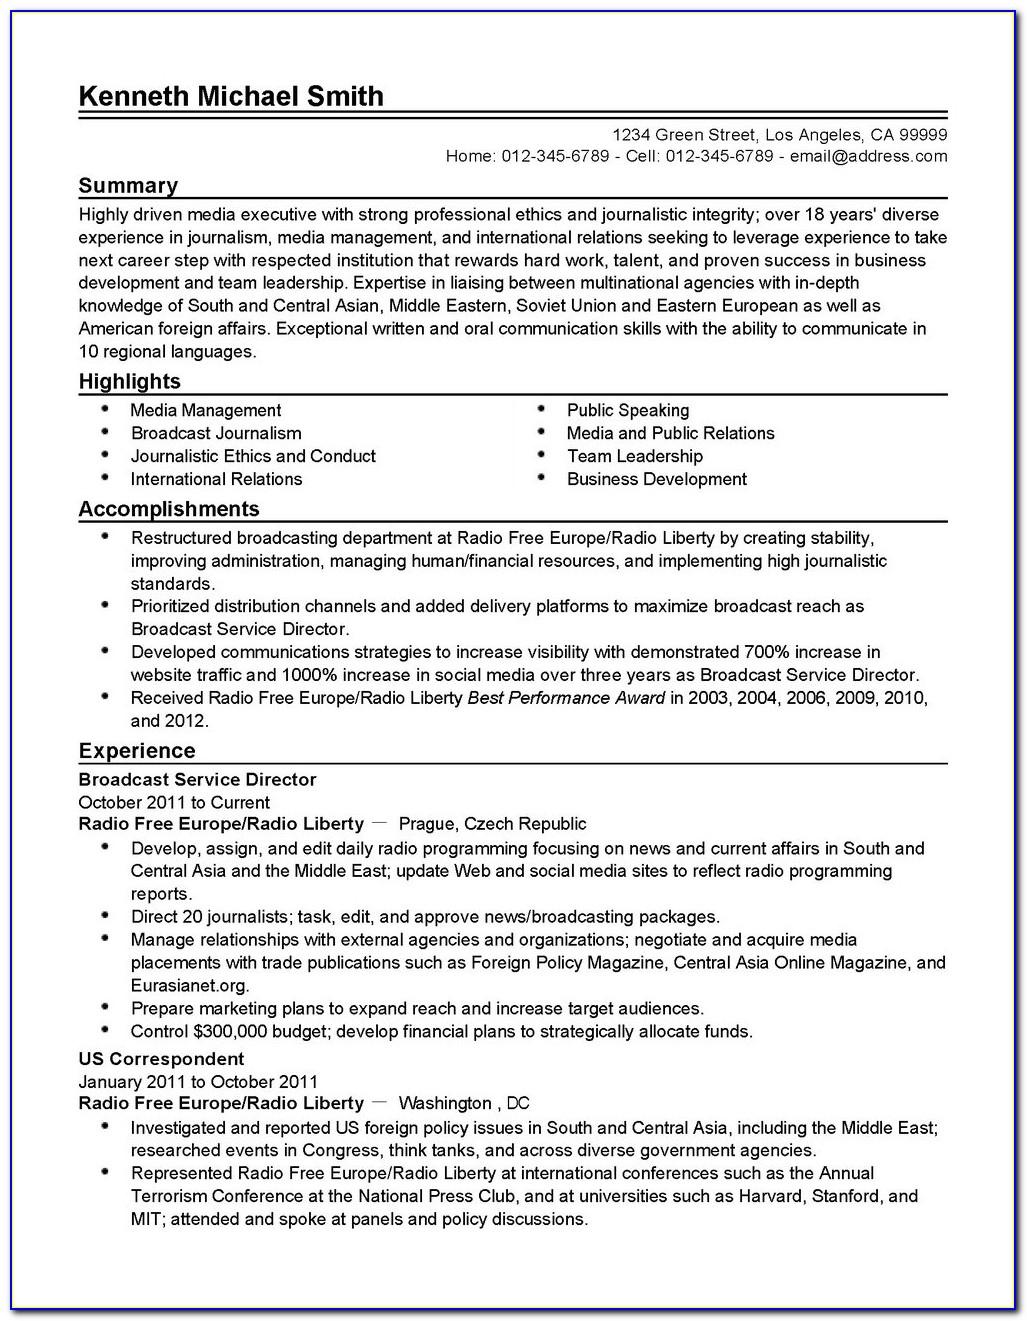 Resume Company Los Angeles